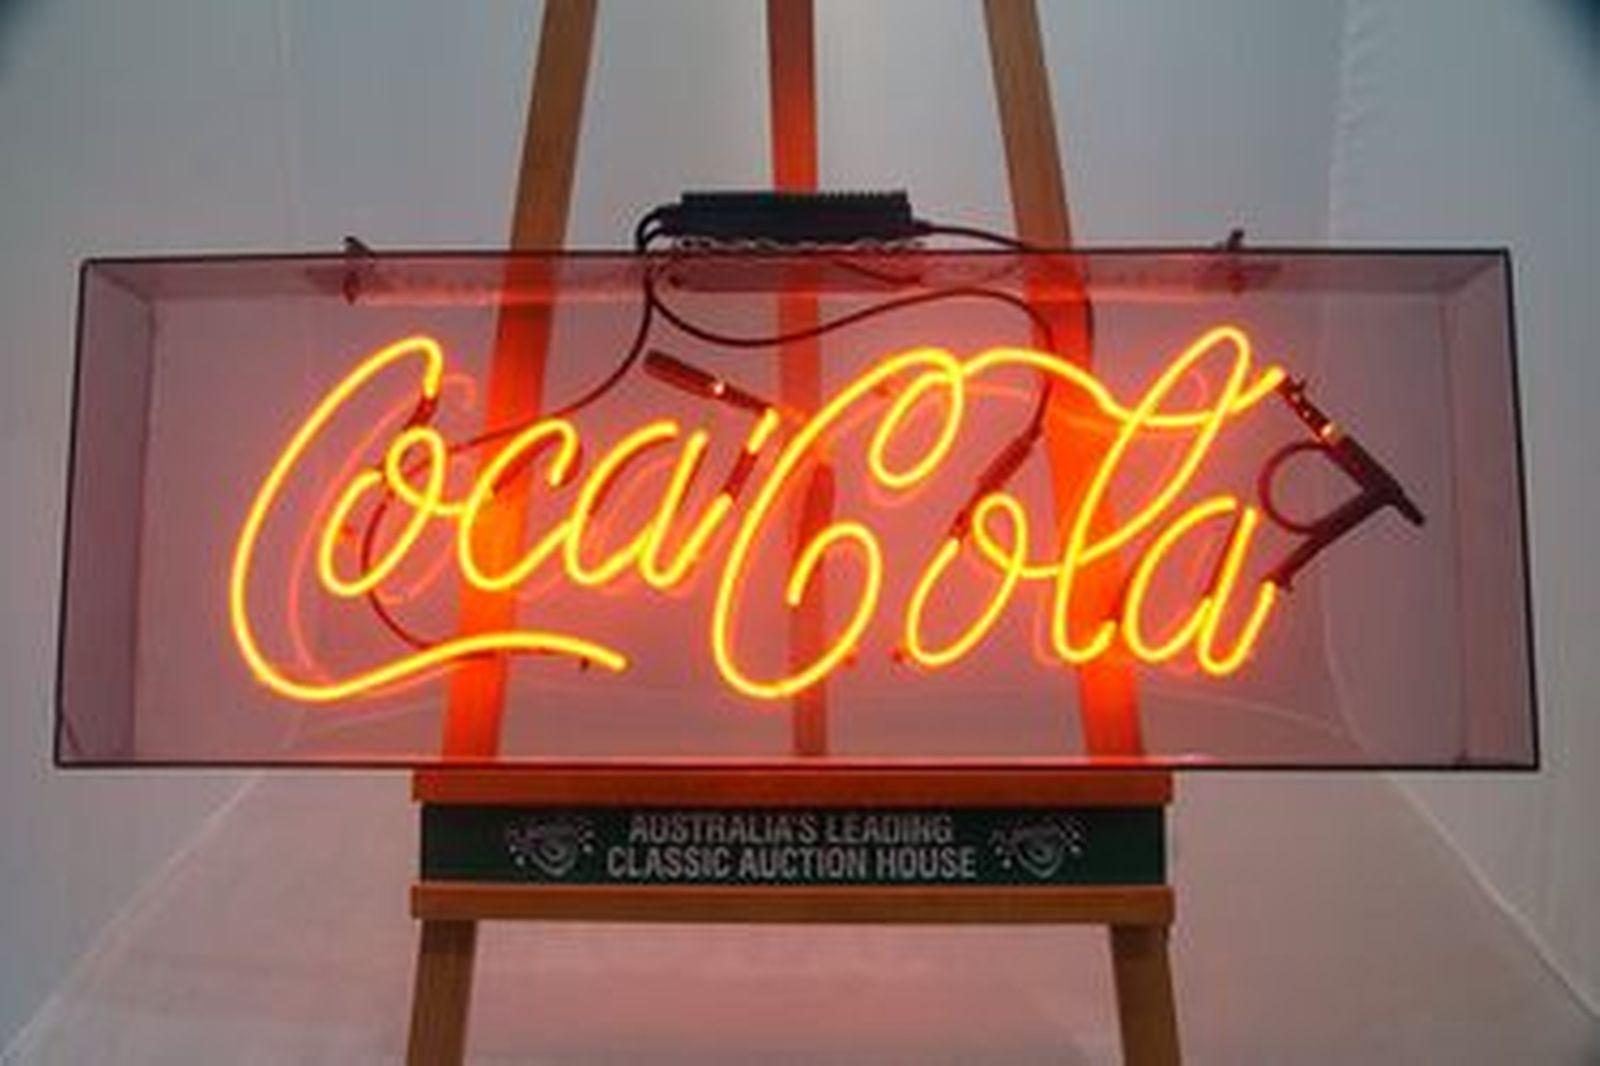 Neon Sign - Coca-Cola in perspex case (100 x 45cm)